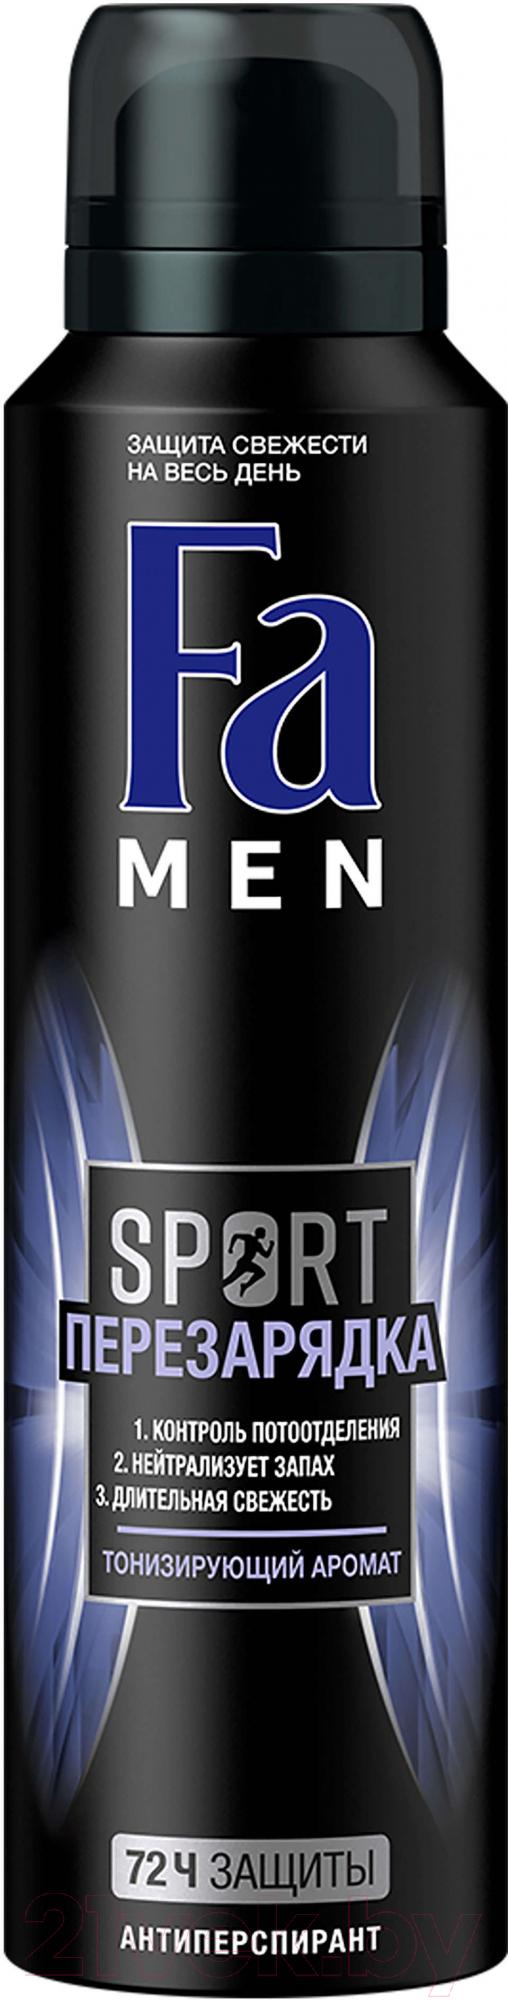 Купить Дезодорант-спрей Fa, Men Sport перезарядка (150мл), Россия